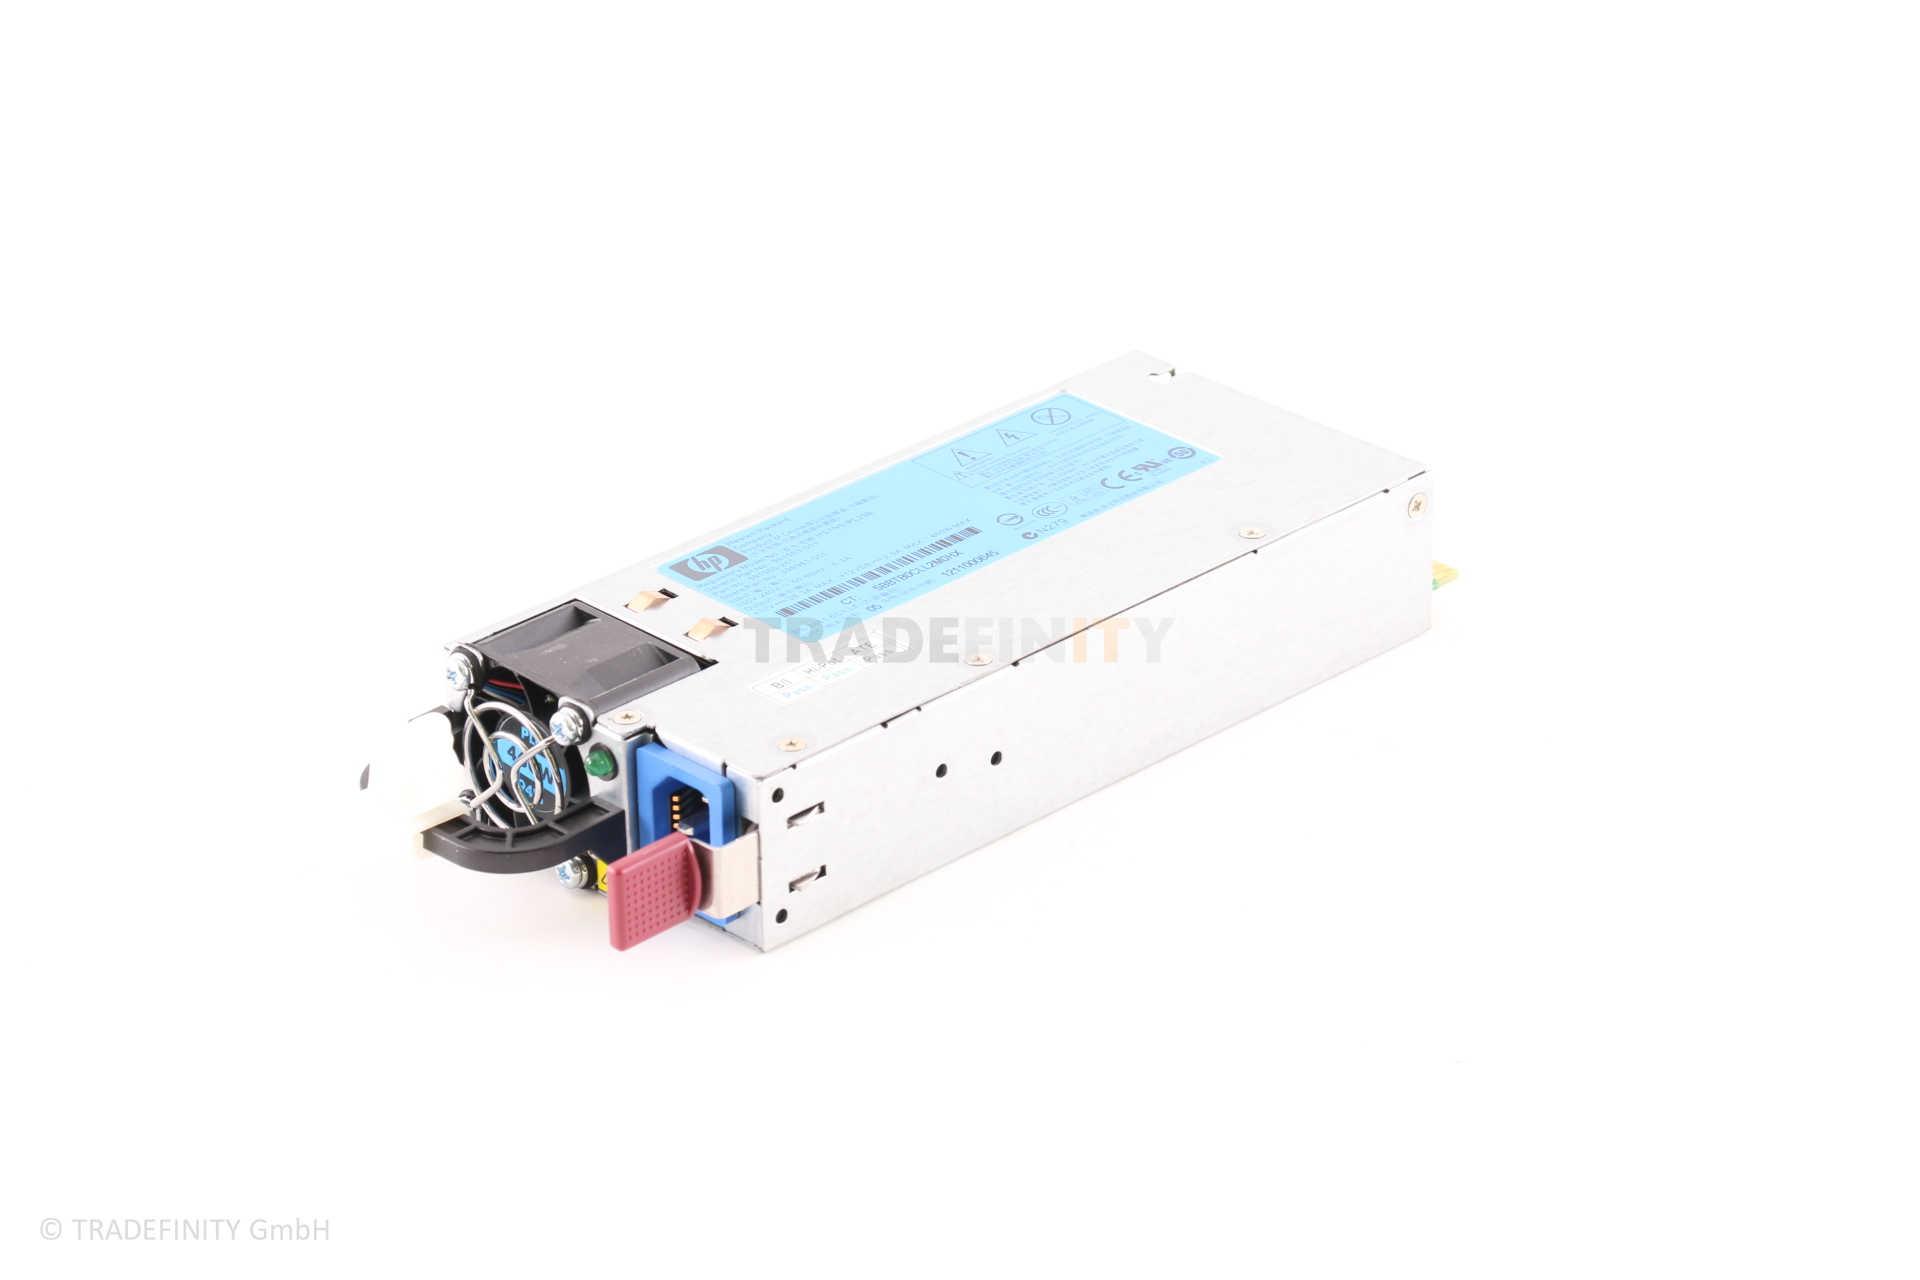 460 W Common Slot Hot Plug Power Supply